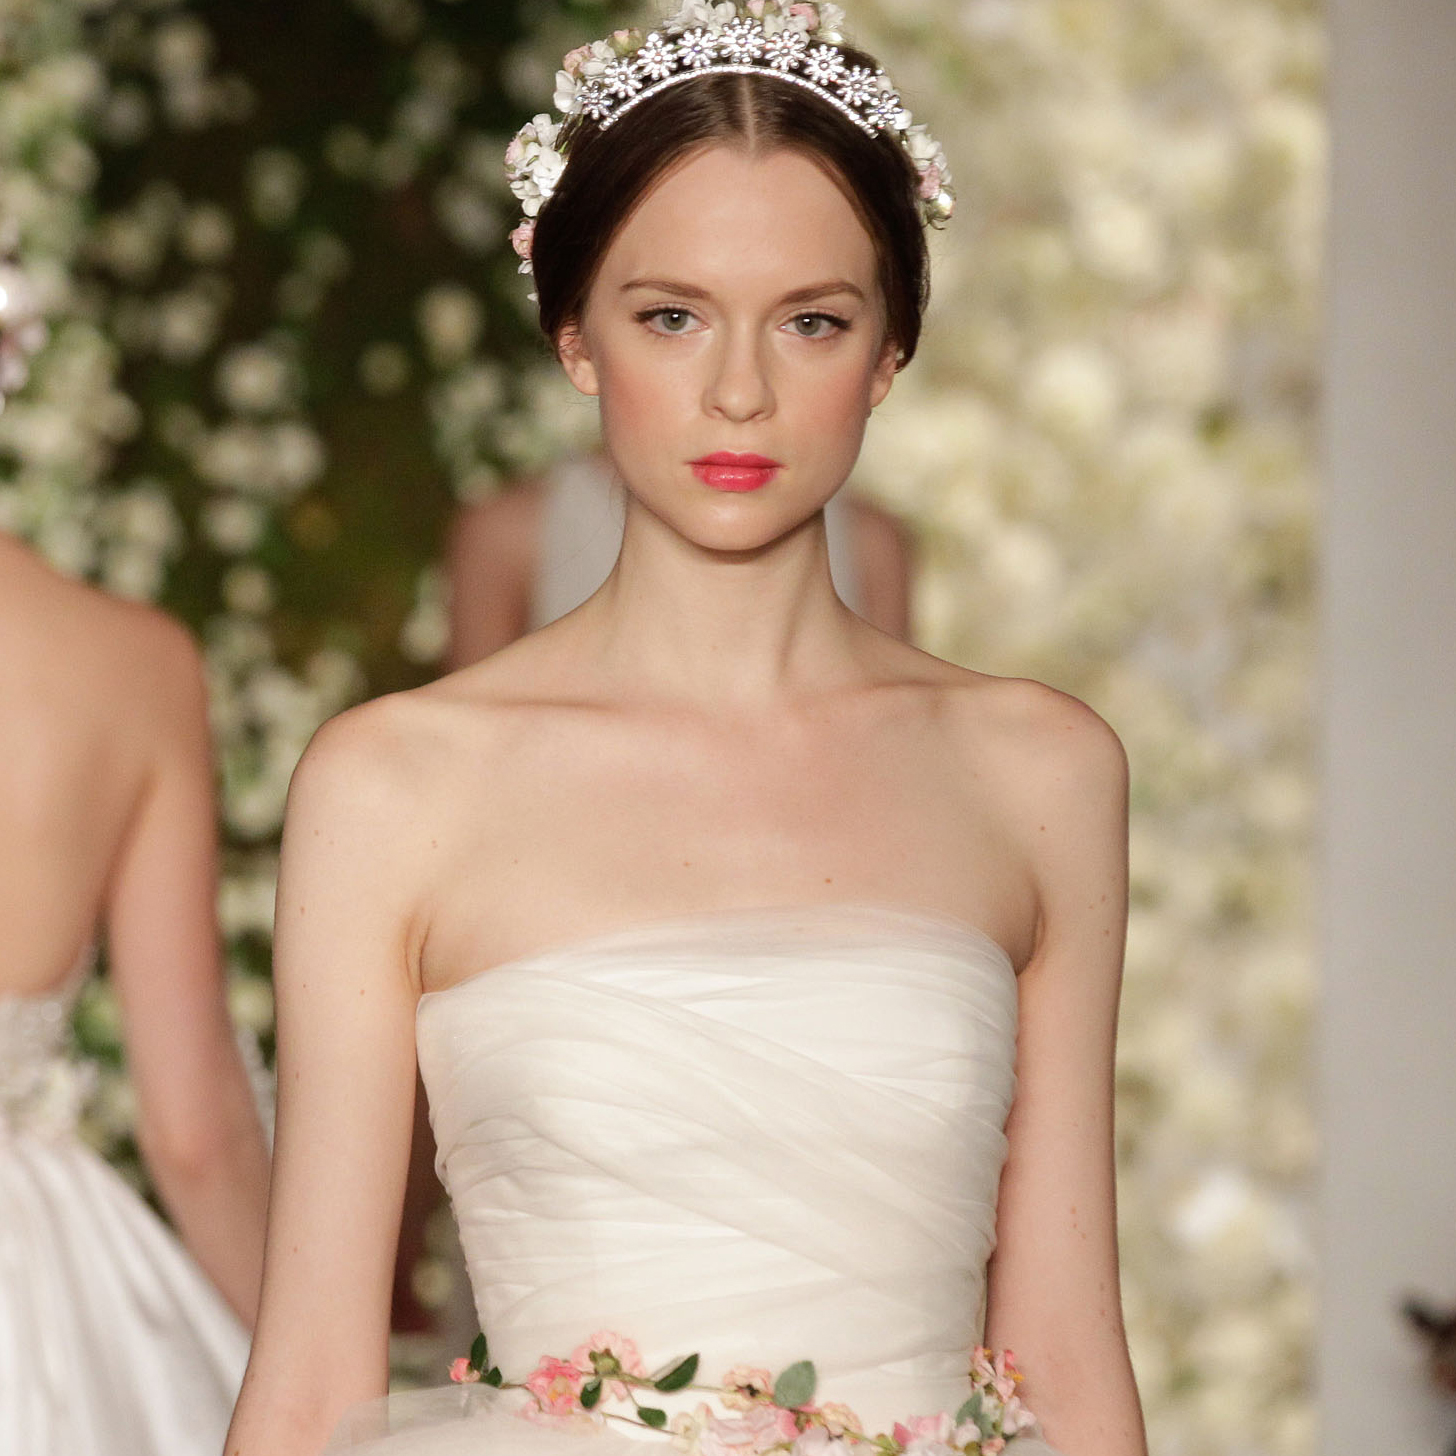 6 Unexpected Wedding Dress Trends 2015